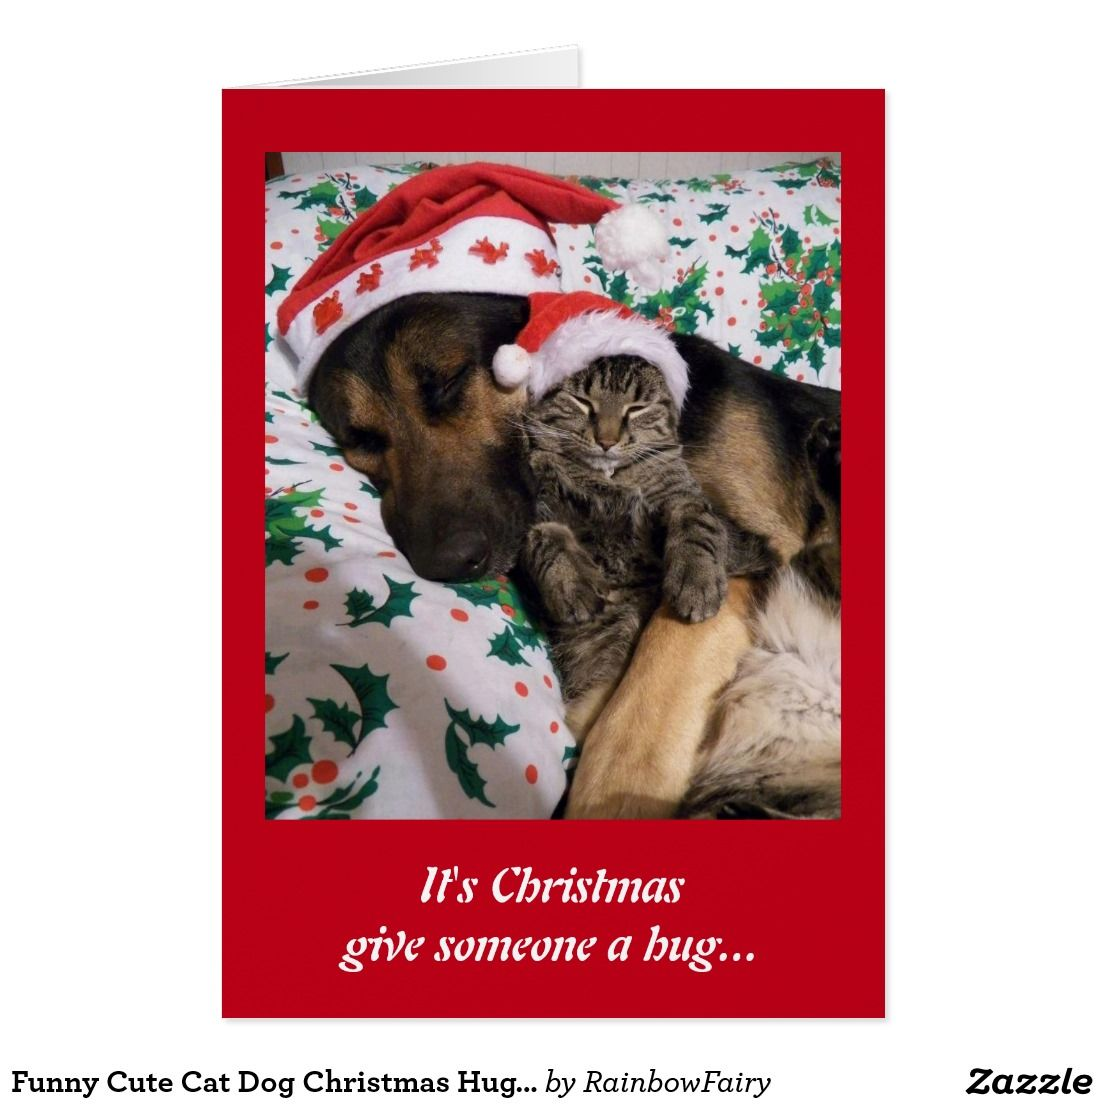 Funny Cute Cat Dog Christmas Hugs Greeting Card Funny Cute